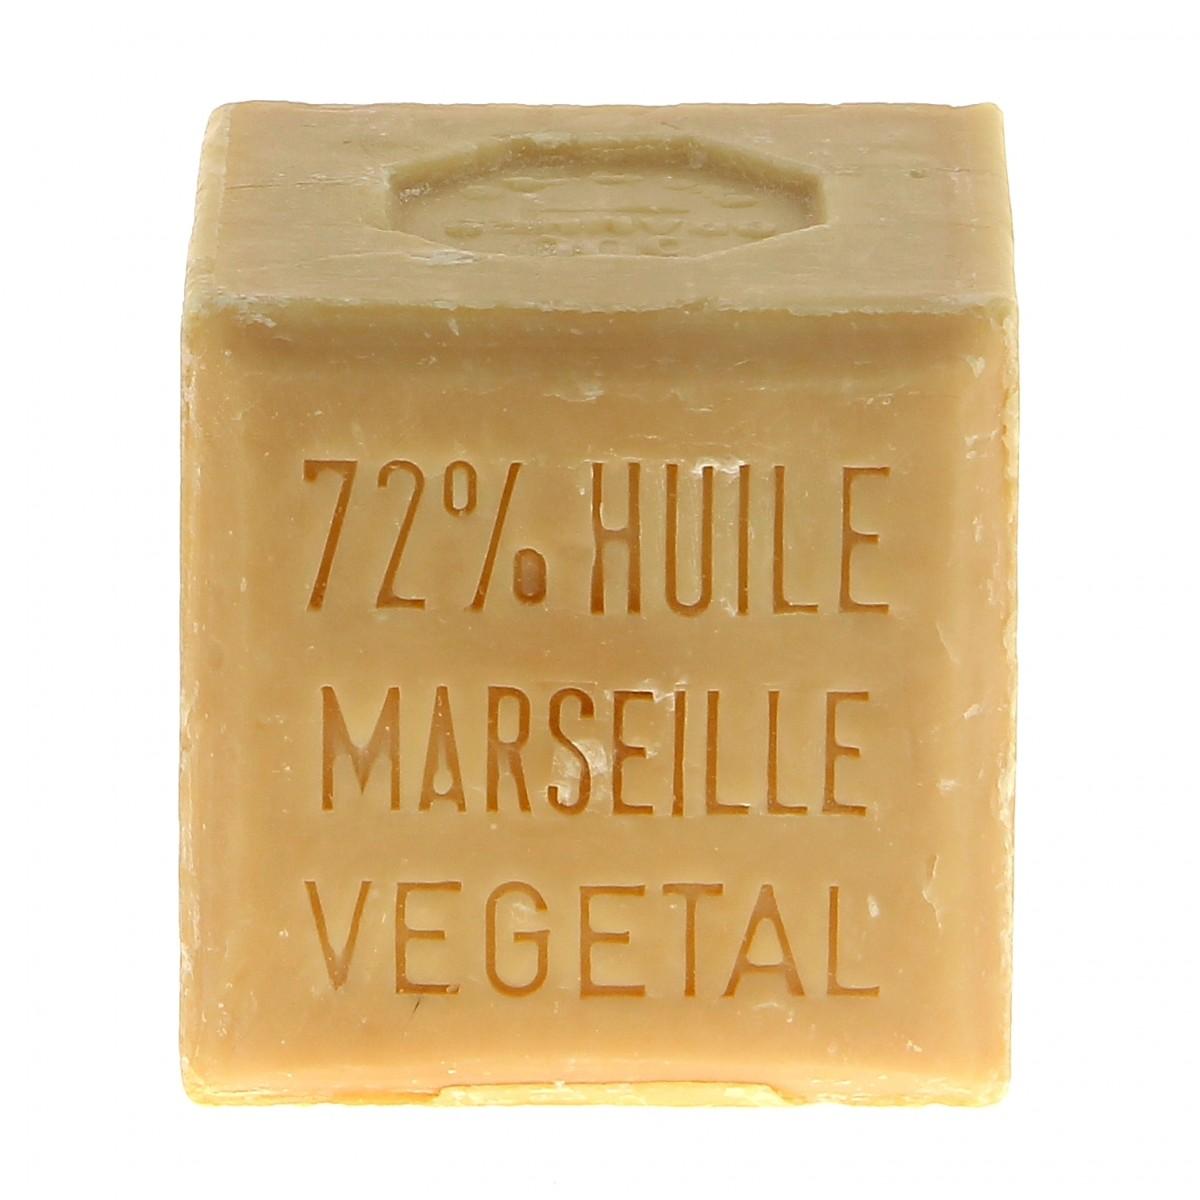 Savon de marseille cube blanc 600 g sebio - Composition savon de marseille ...